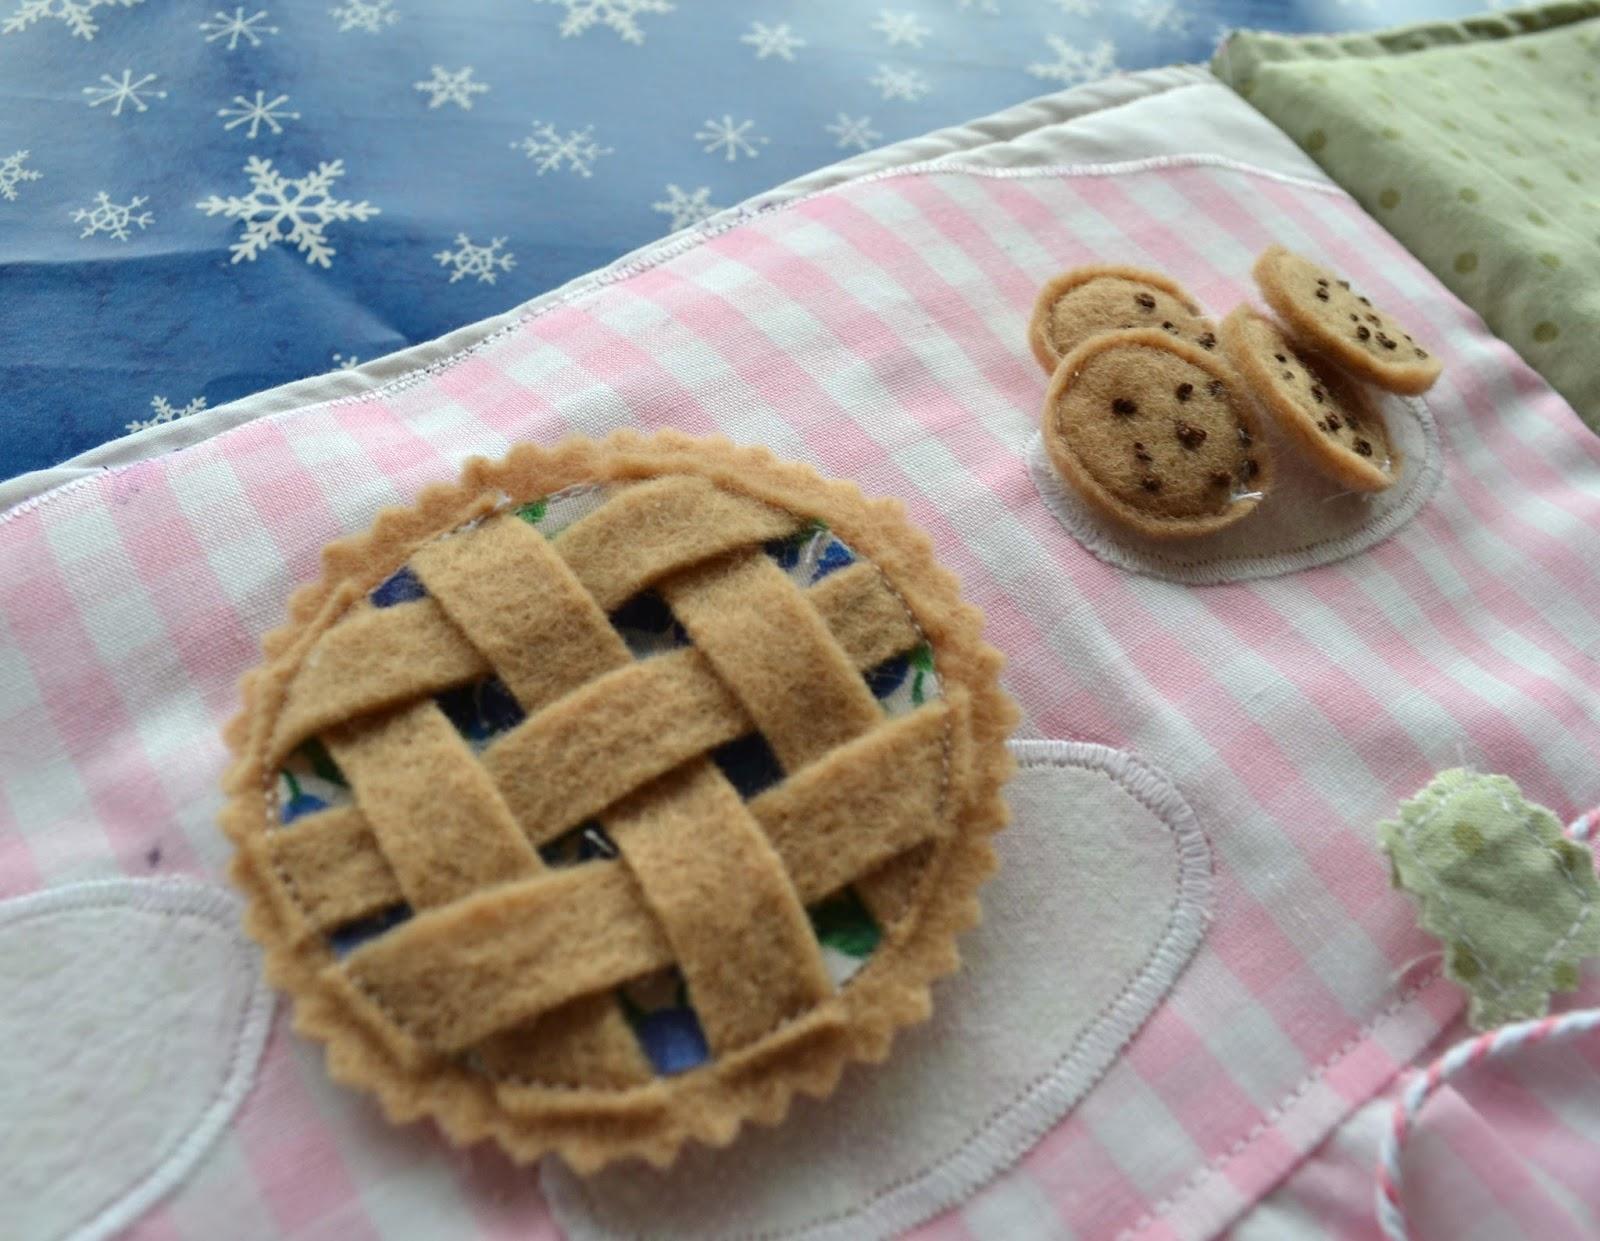 miniature felt pie and cookies